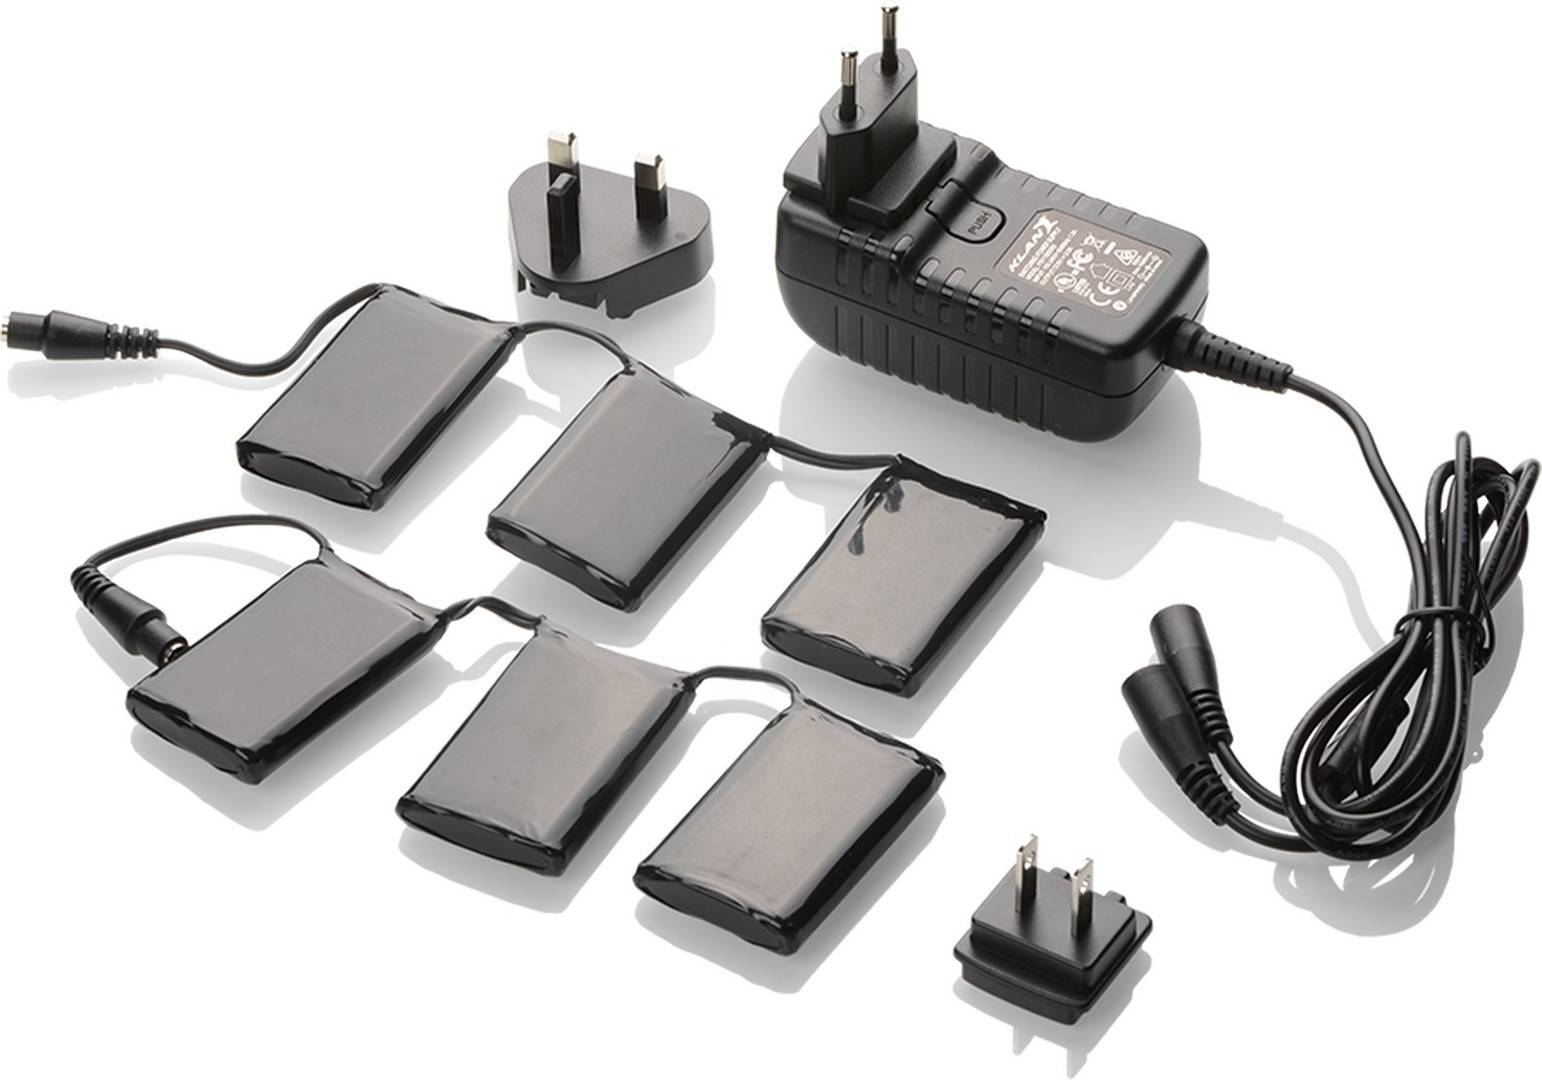 Klan-e 12V/3A Batteriet Kit